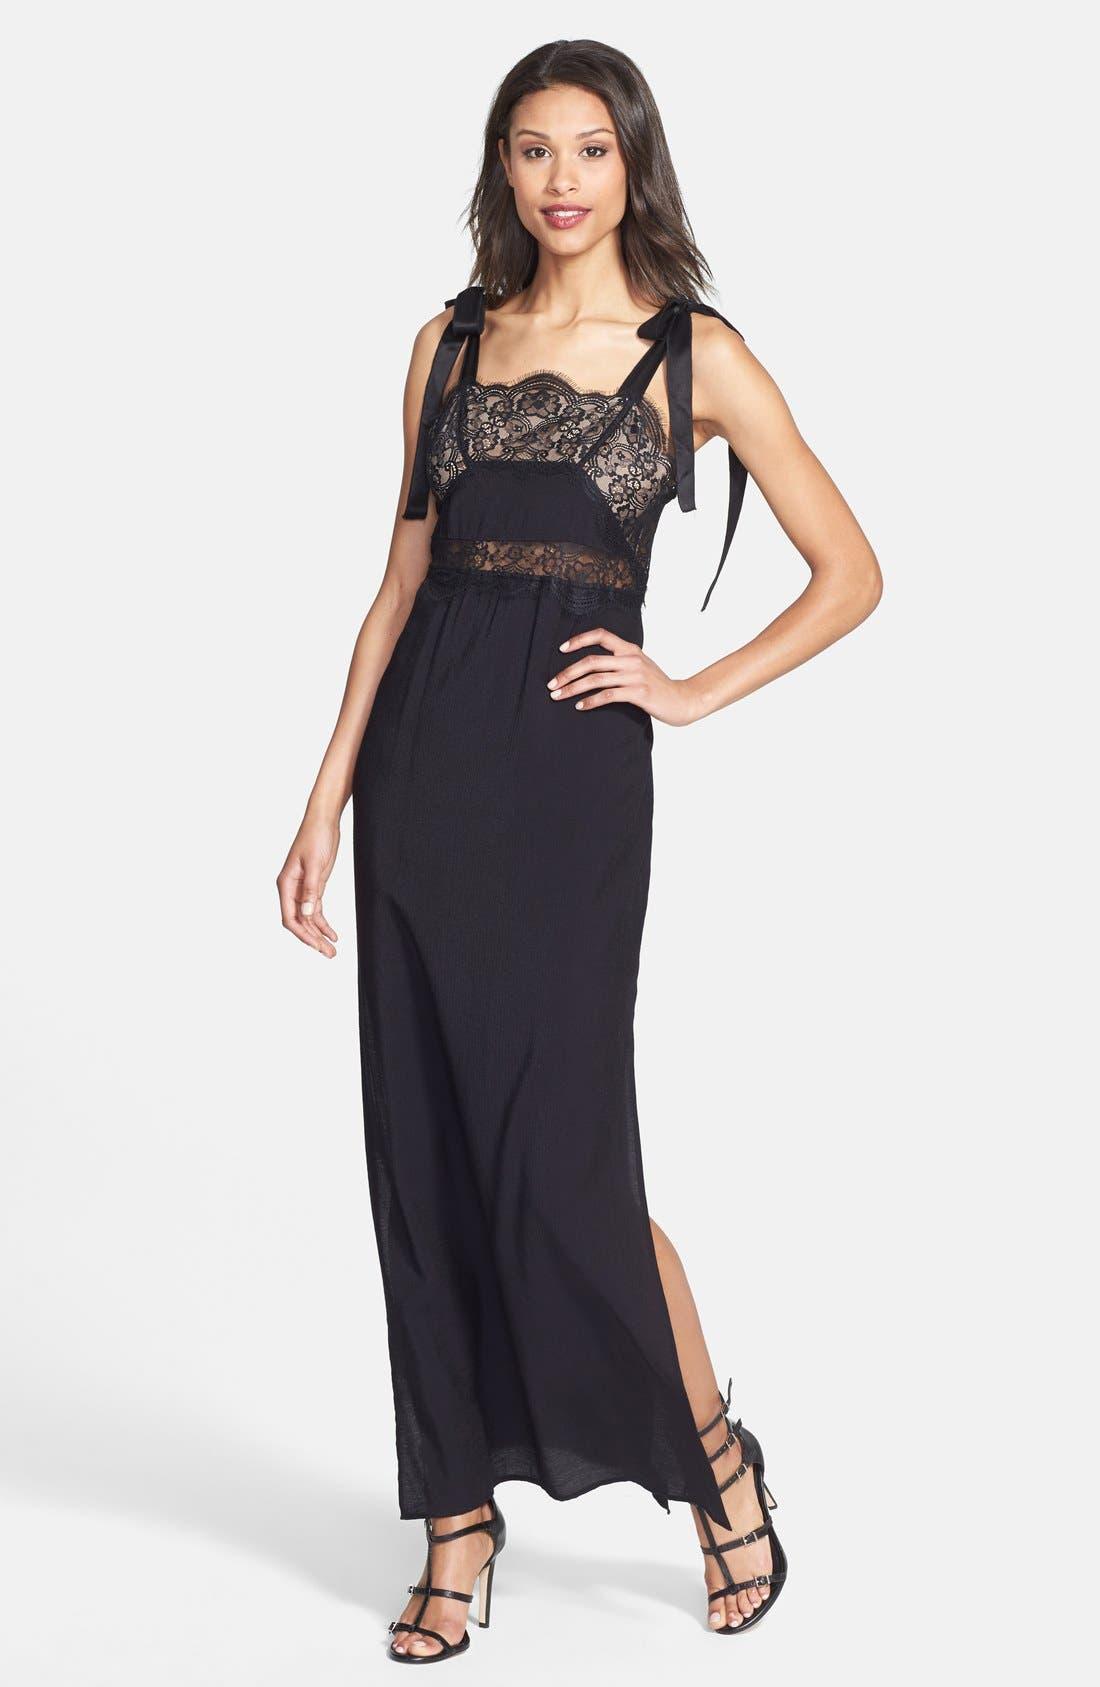 Main Image - For Love & Lemons 'Sweet Tea' Lace Trim Crepe Maxi Dress